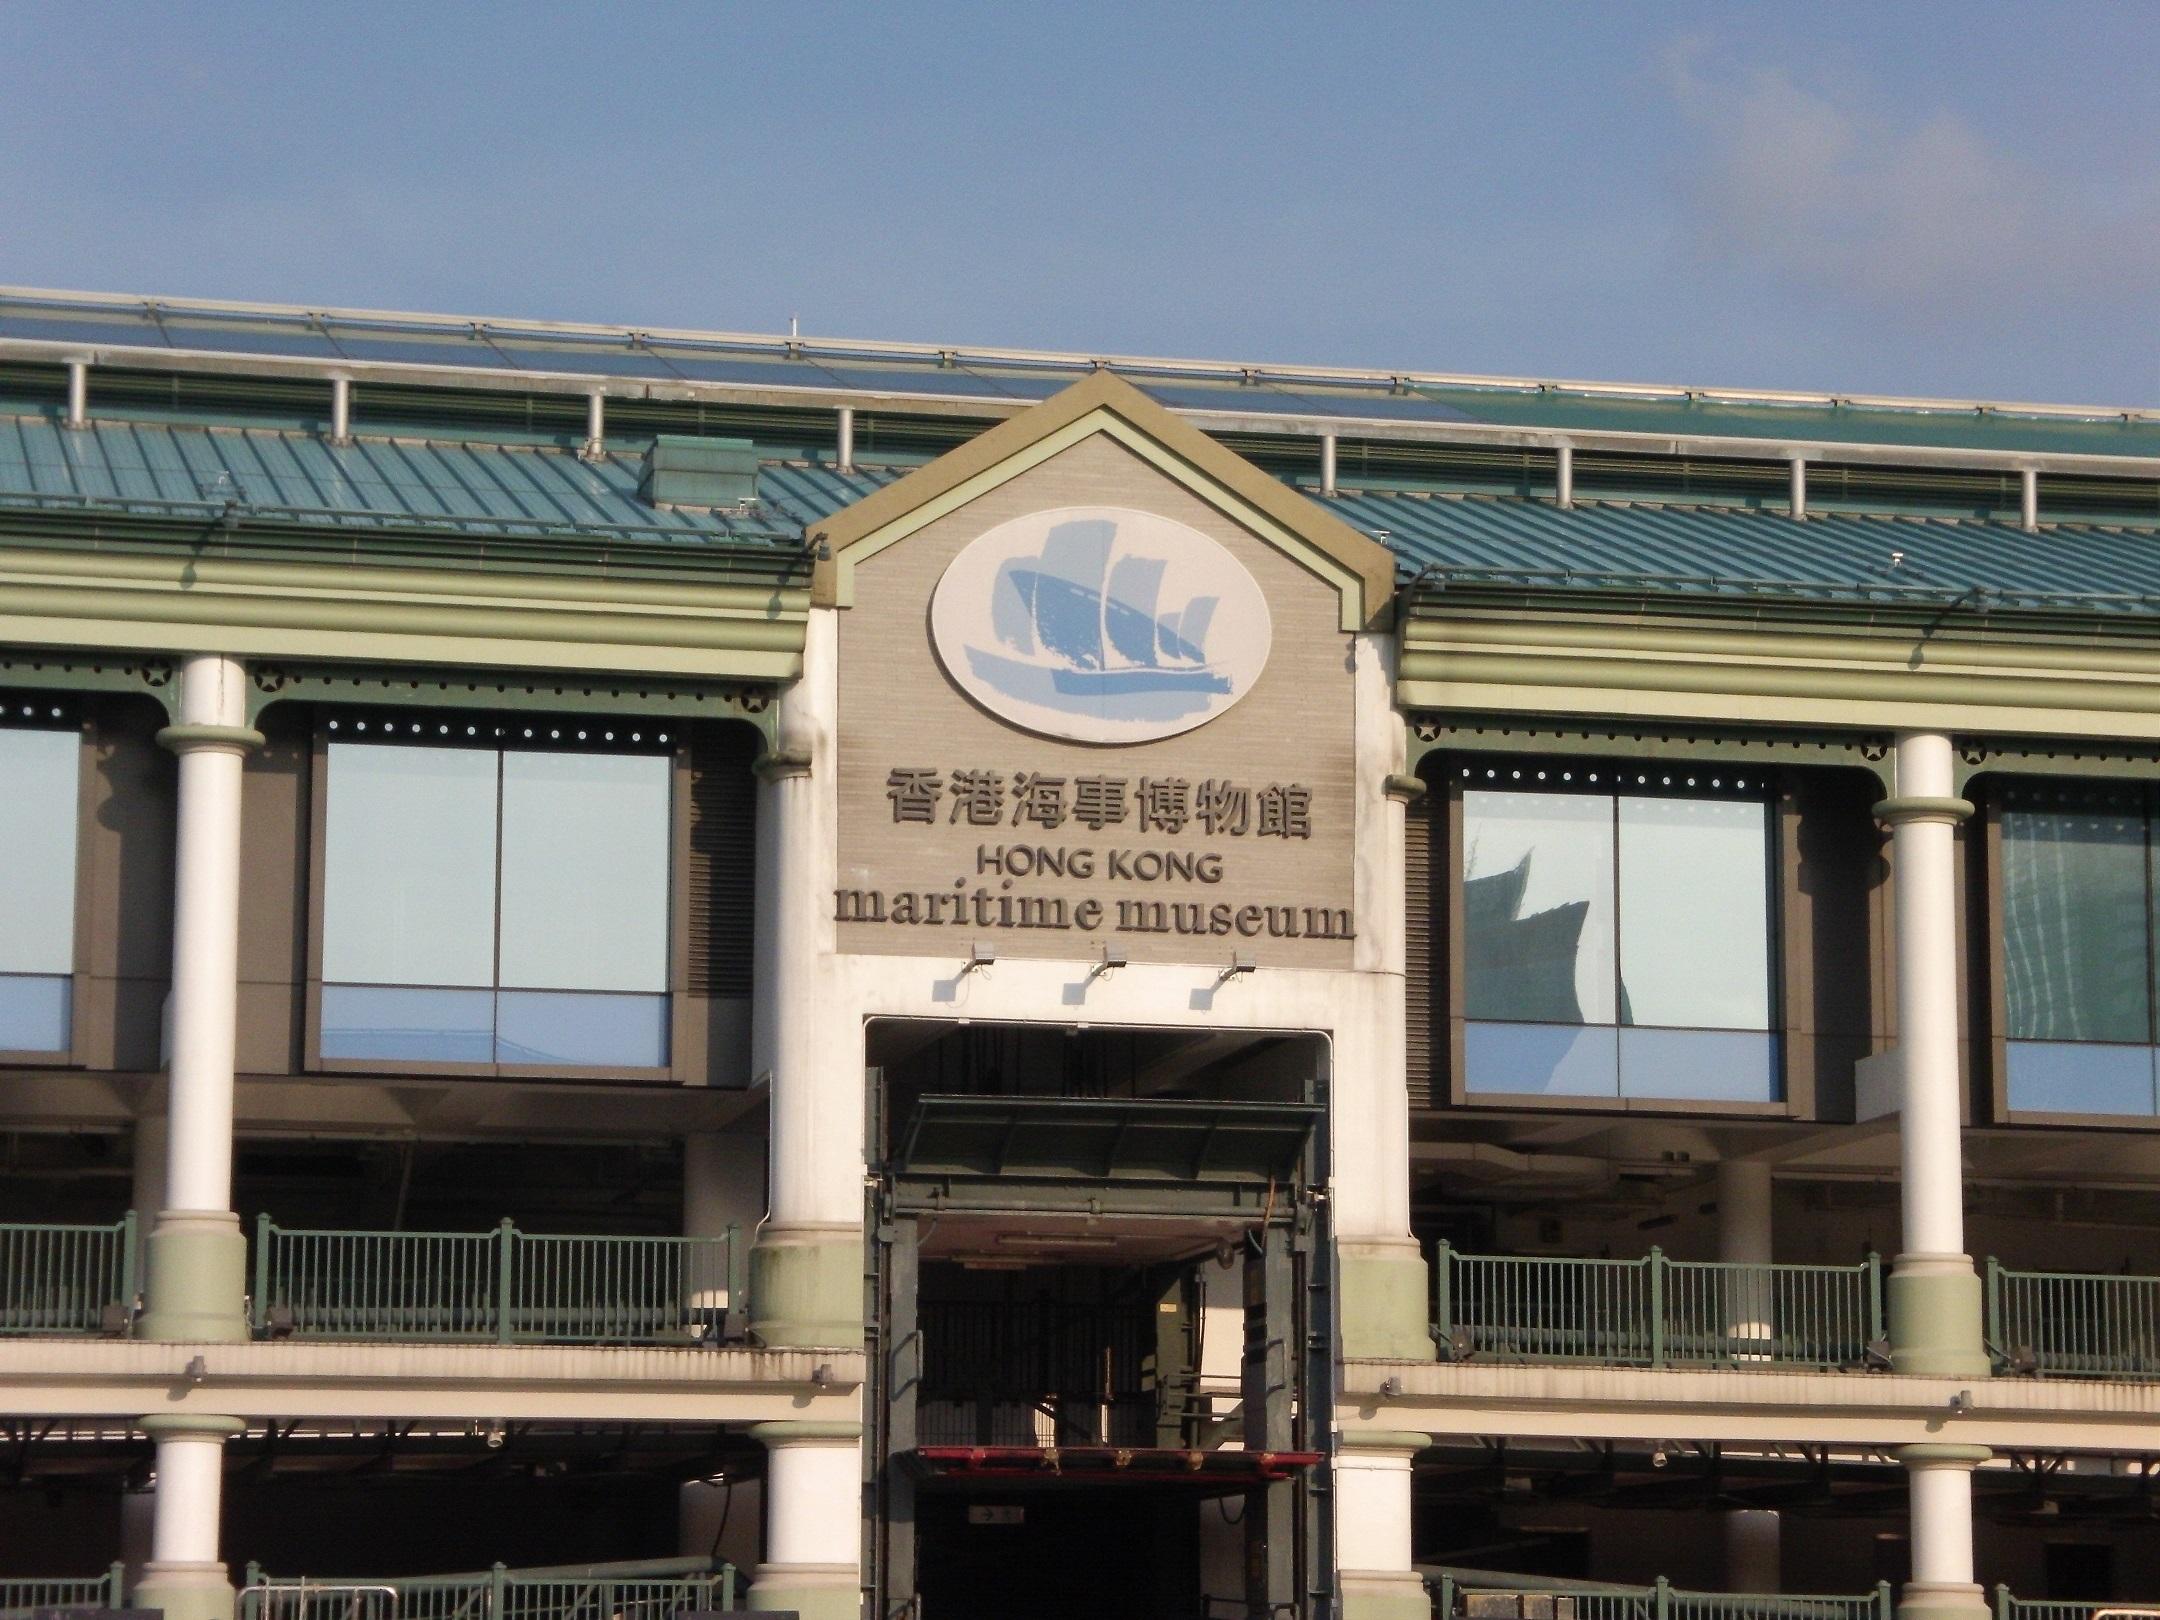 Hong Kong Maritime Museum is near the Central Star Ferry Pier.